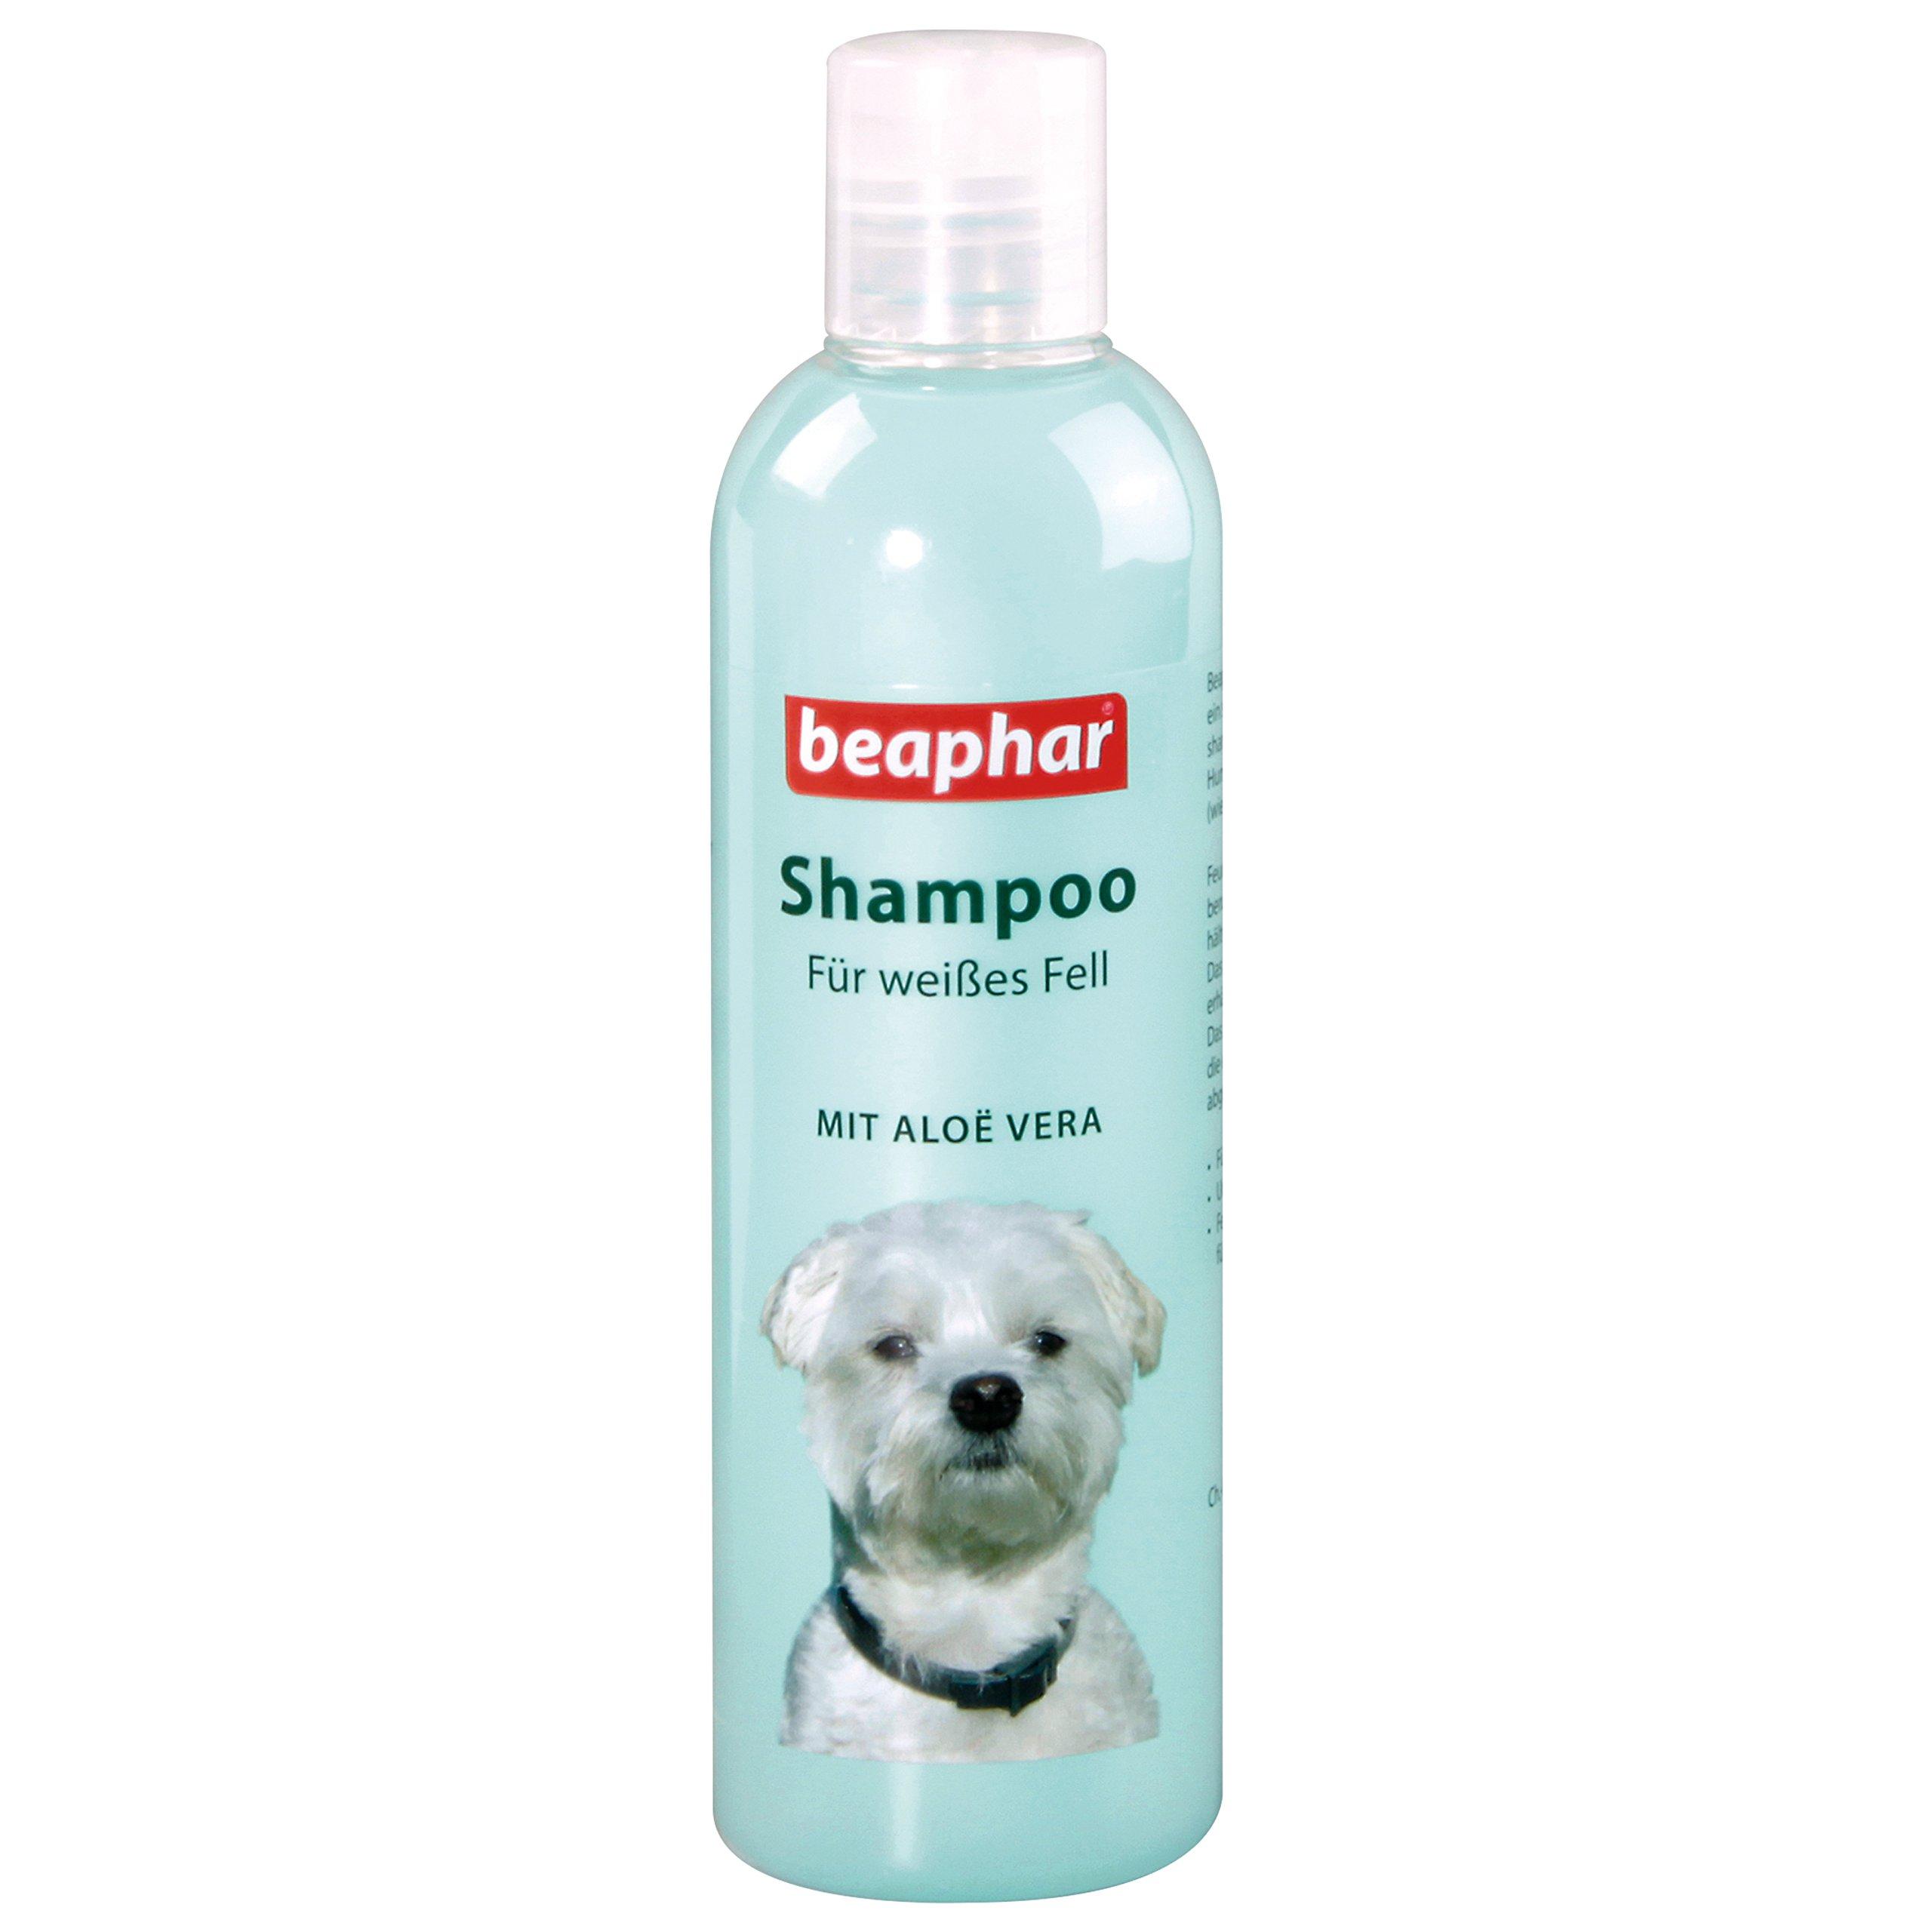 Beaphar Dog Shampoo for White Coats. PH Neutral Dog Shampoo with Aloe Vera Shampoo for Maltese & Havanese Dog Shampoo 250ml